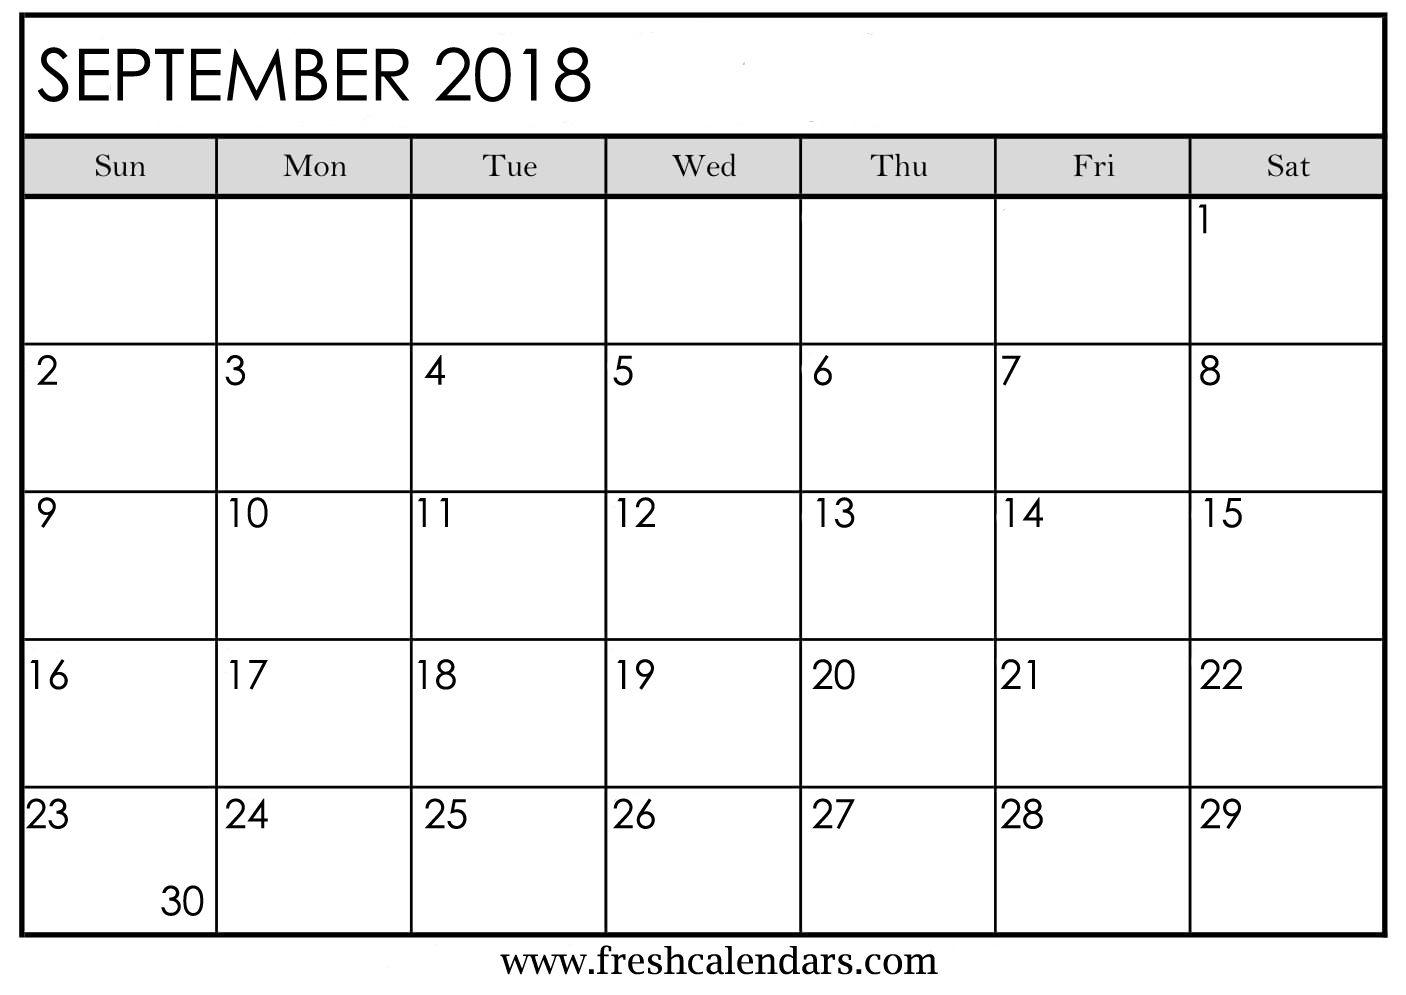 September 2018 Calendar Printable - Fresh Calendars with regard to September Printable Monthly Calendars Blank